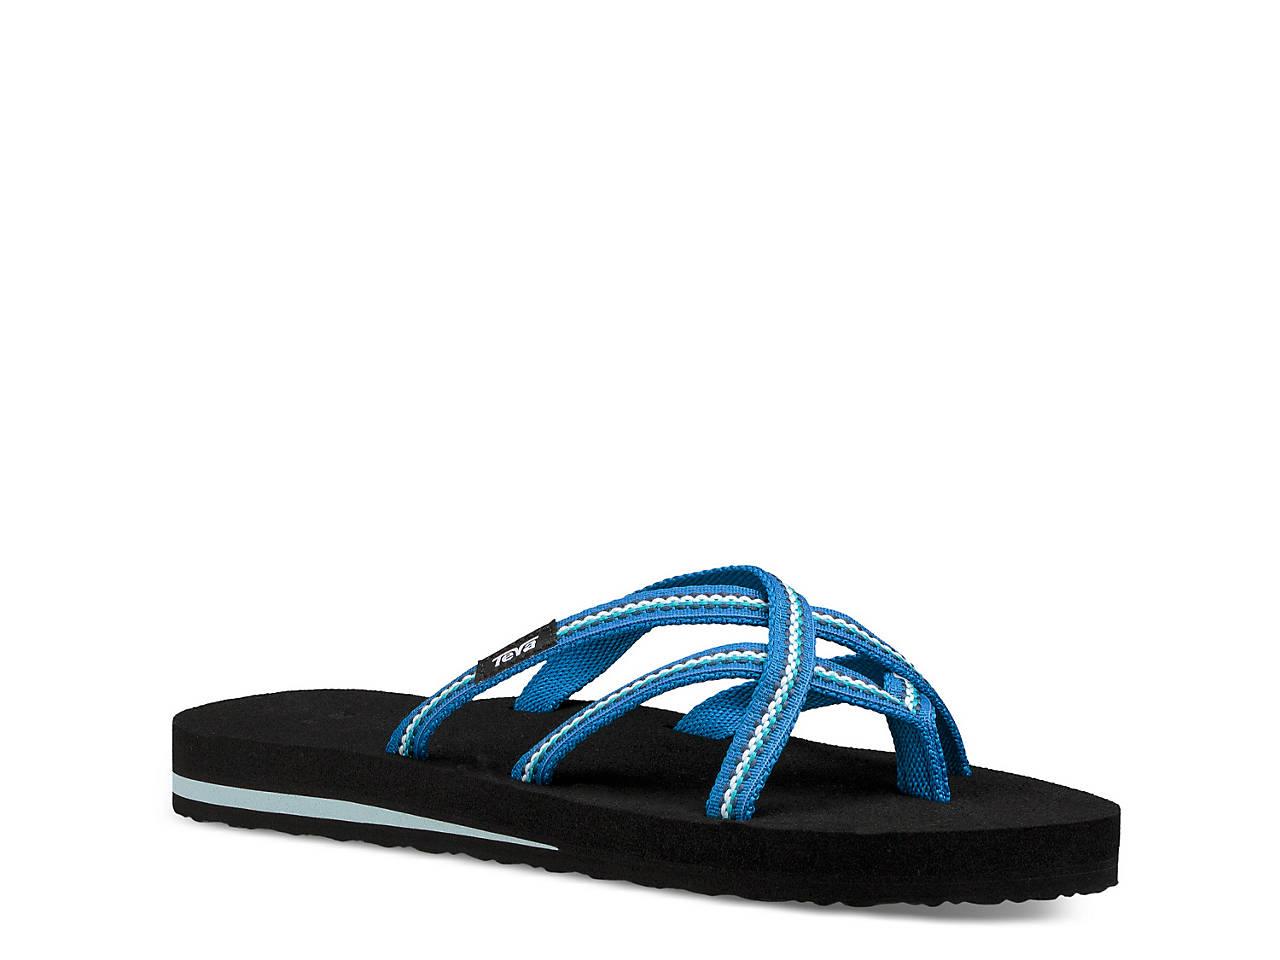 55a732756 Teva Olowahu Sandal Women s Shoes